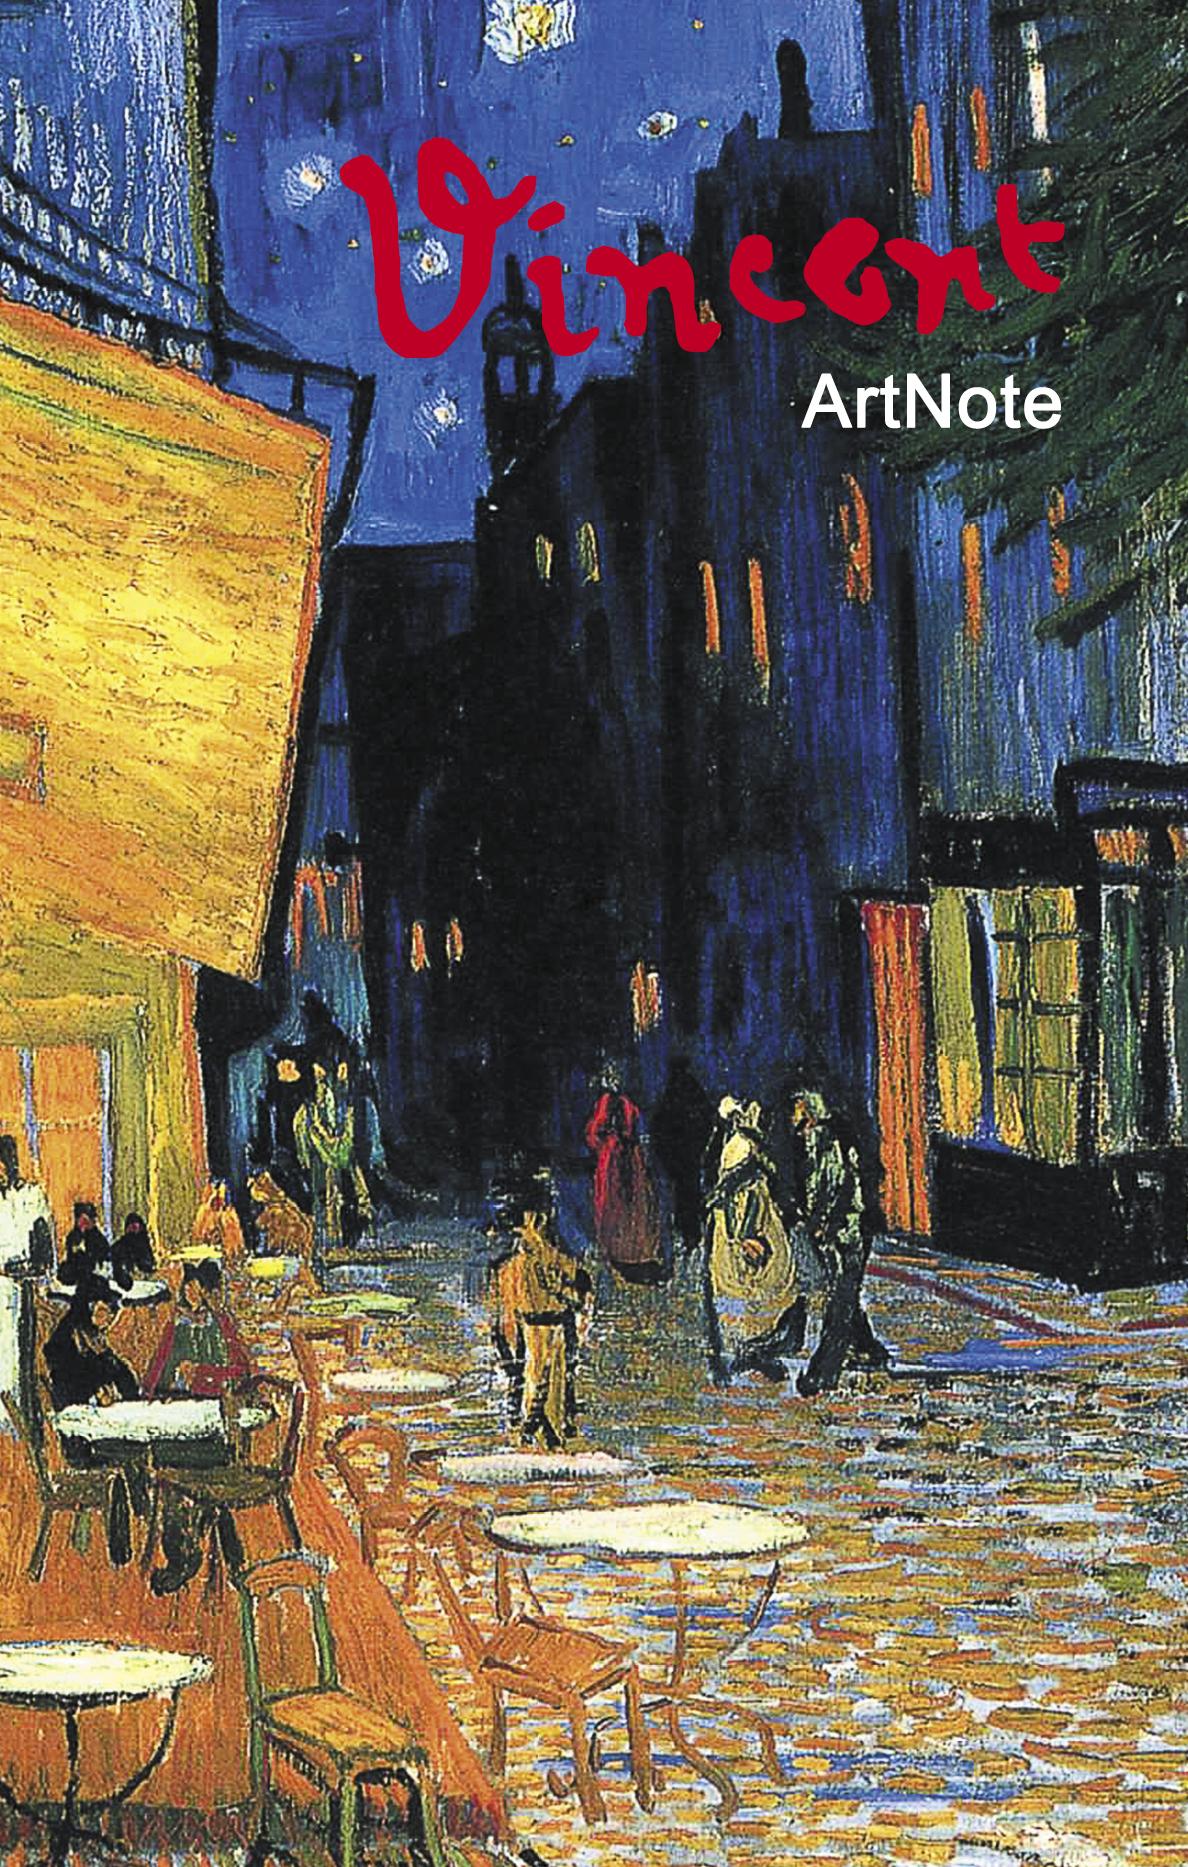 ��� ���. ArtNote. ������ ����